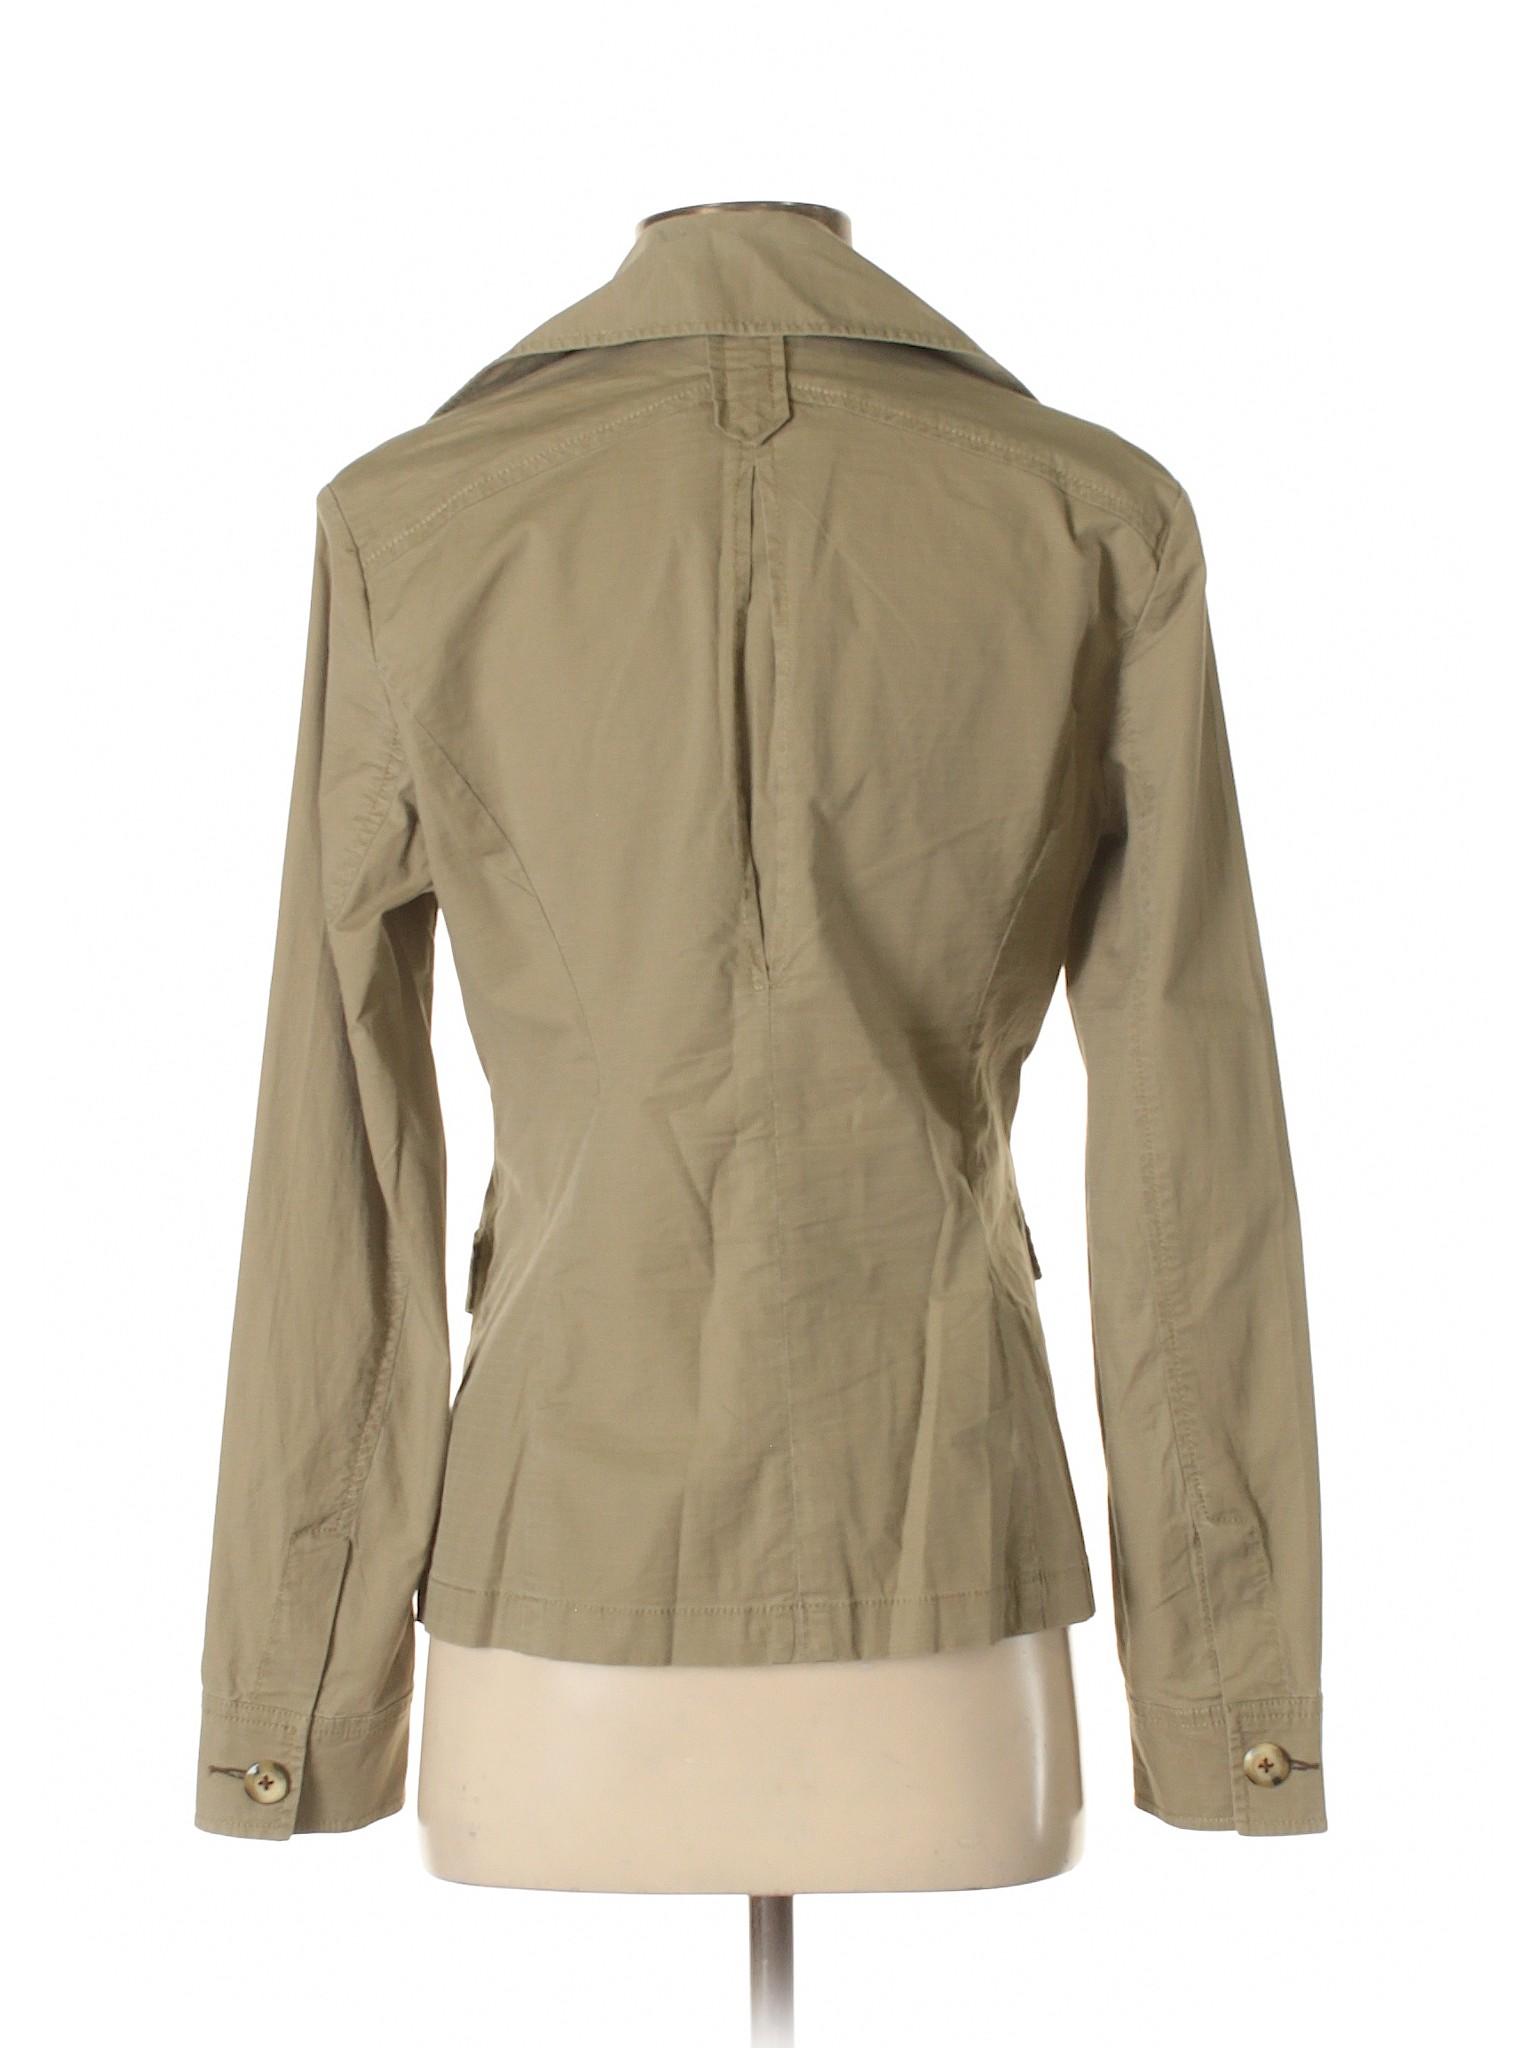 CAbi leisure Boutique CAbi Boutique leisure Jacket Ytdxqxn